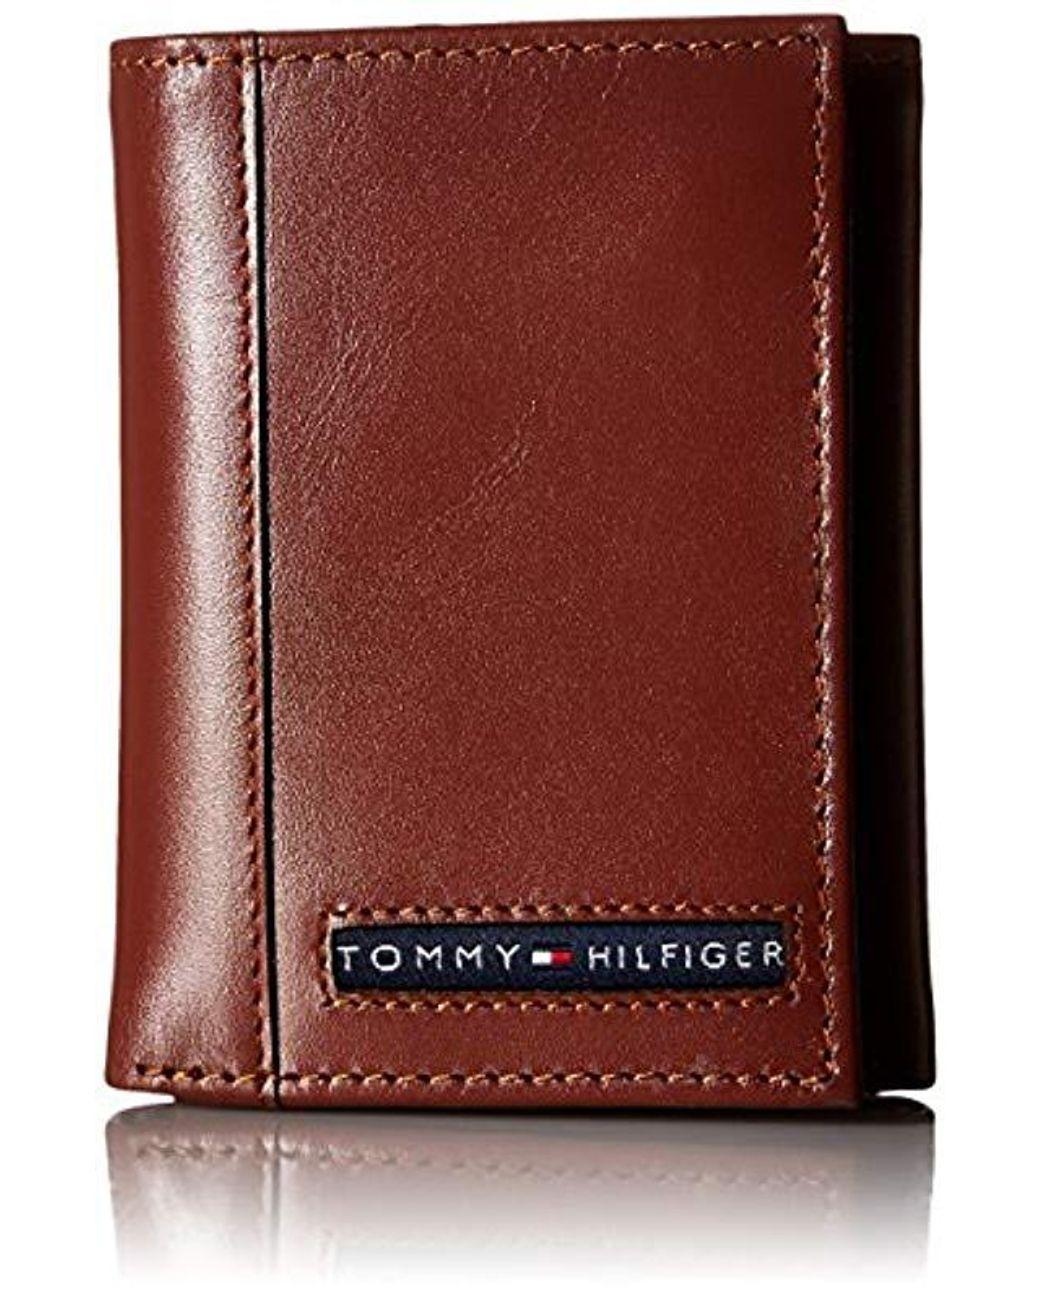 Tommy Hilfiger NEW Men/'s Bifold /& Valet Stitched Premium Leather Logo Wallet